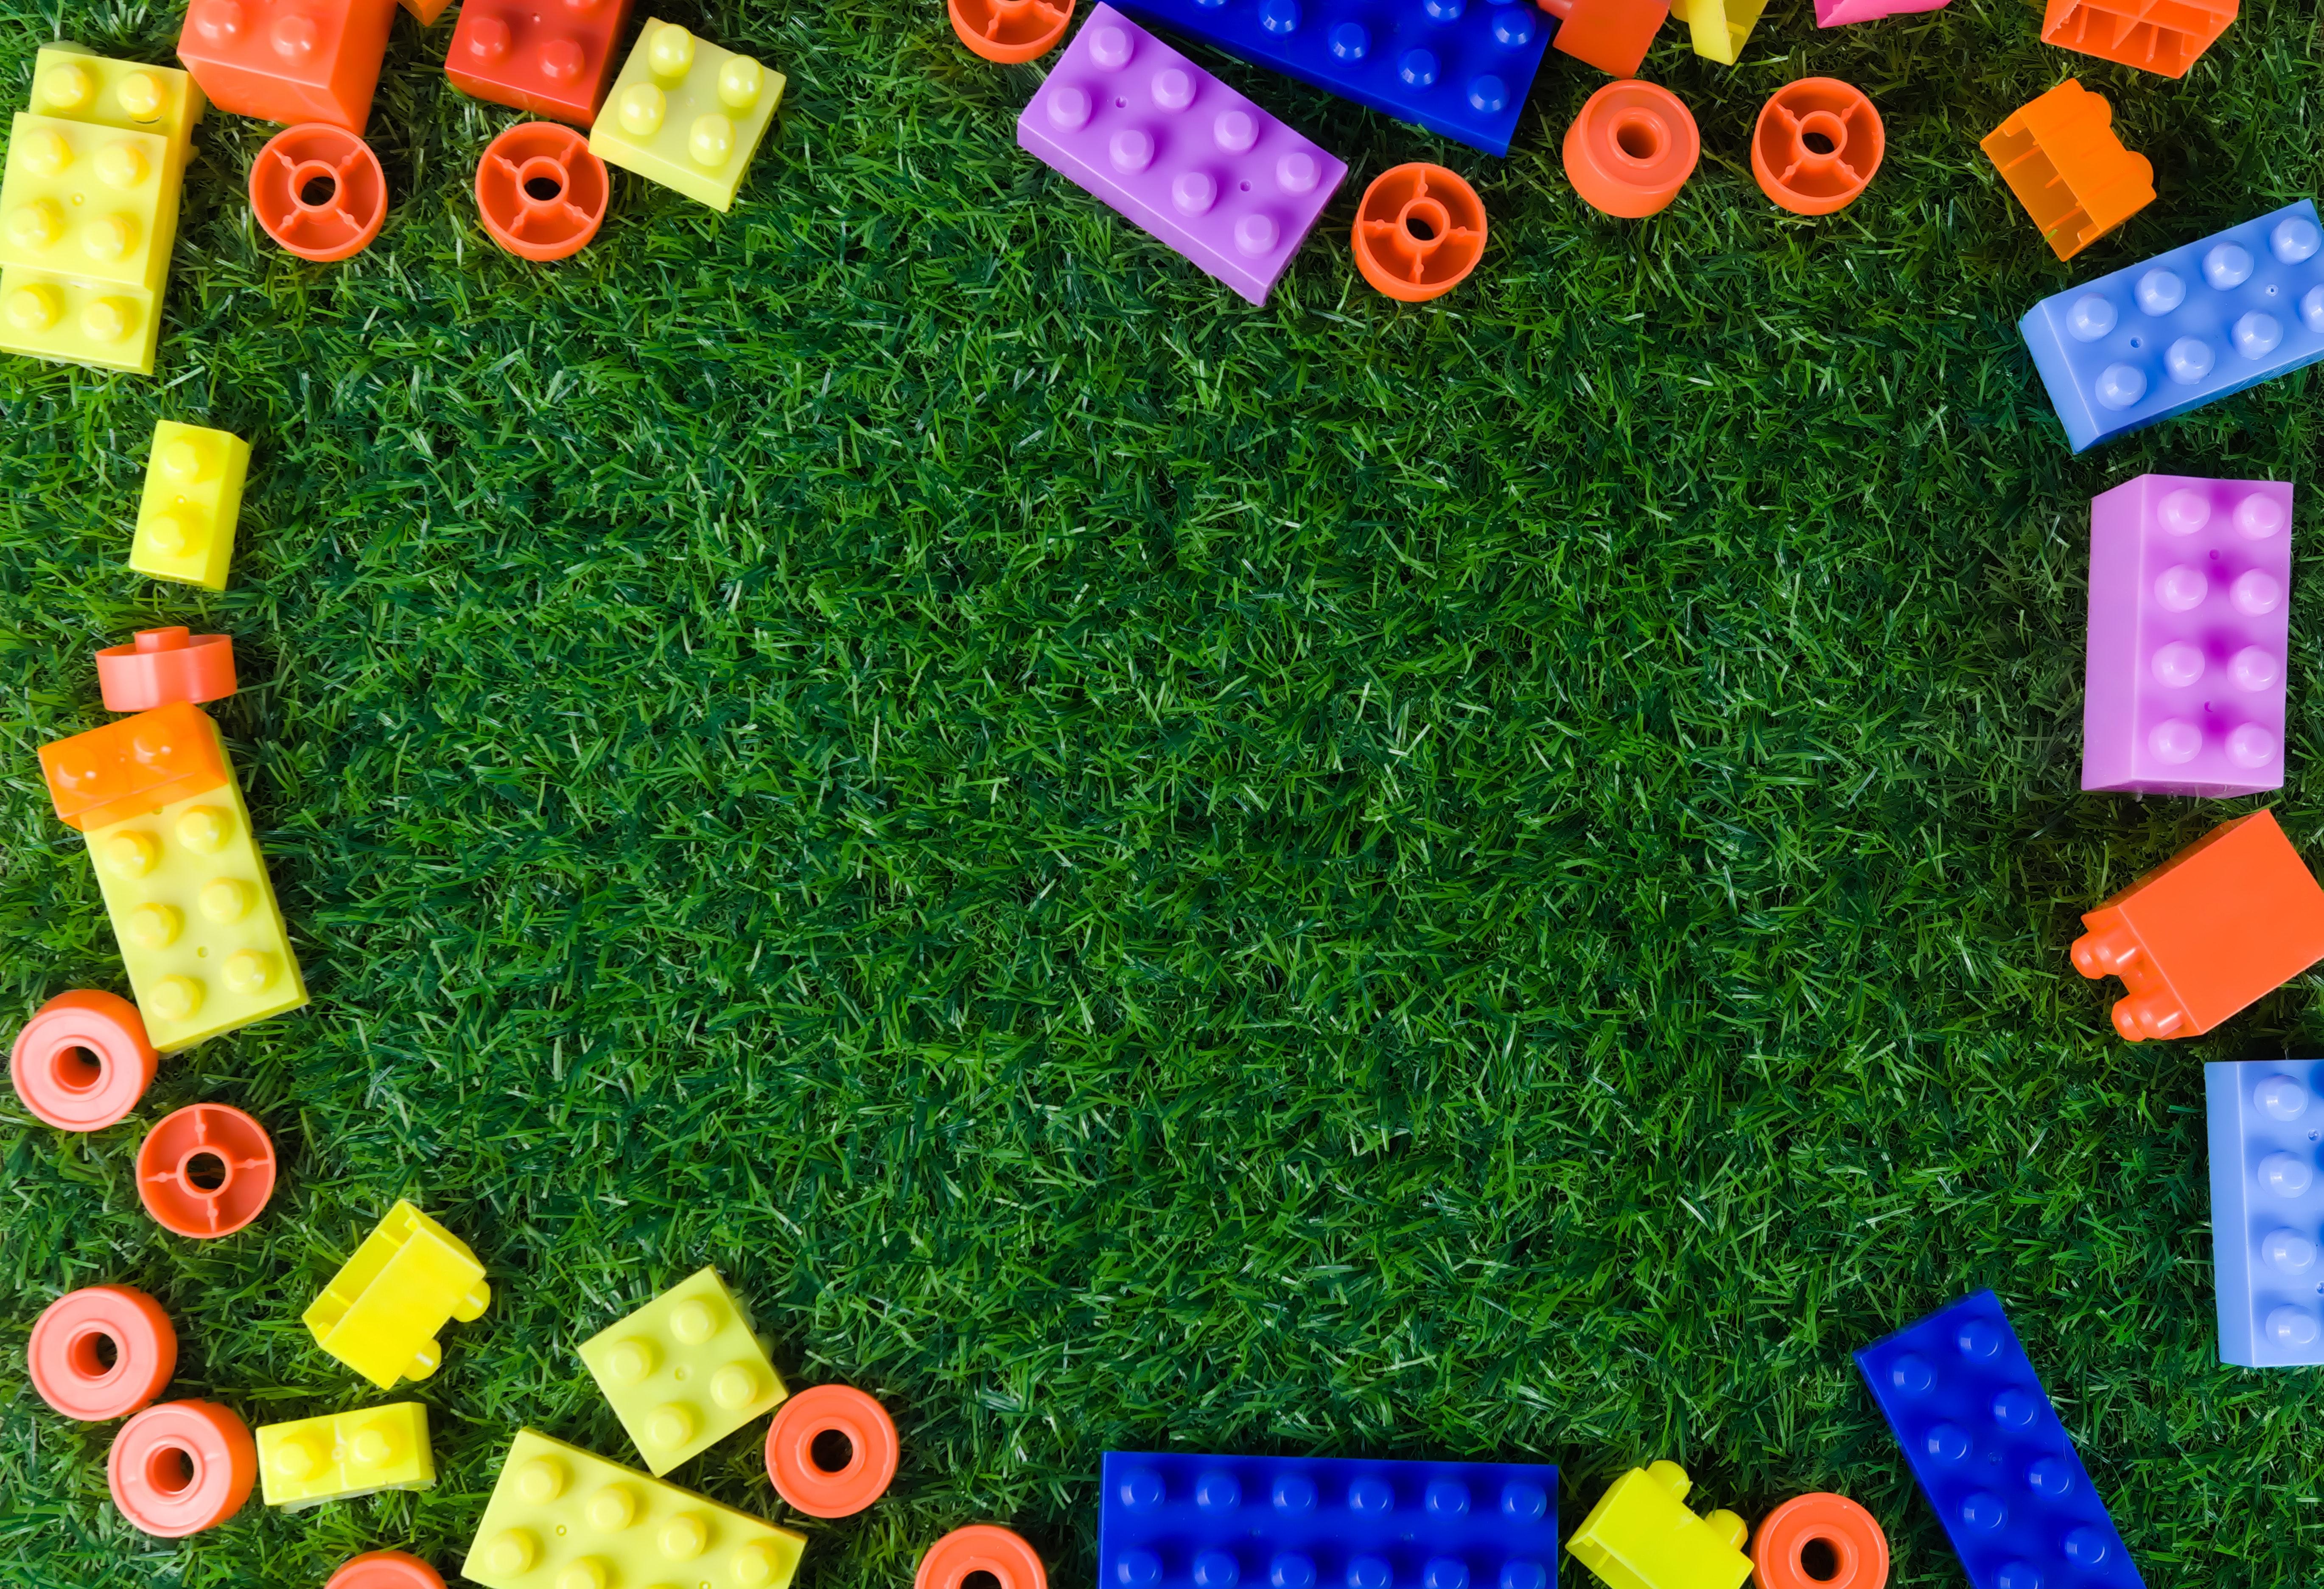 Foto Stok Gratis Tentang Gambar Latar Belakang, Mainan Anak, Mainan Anak- Anak